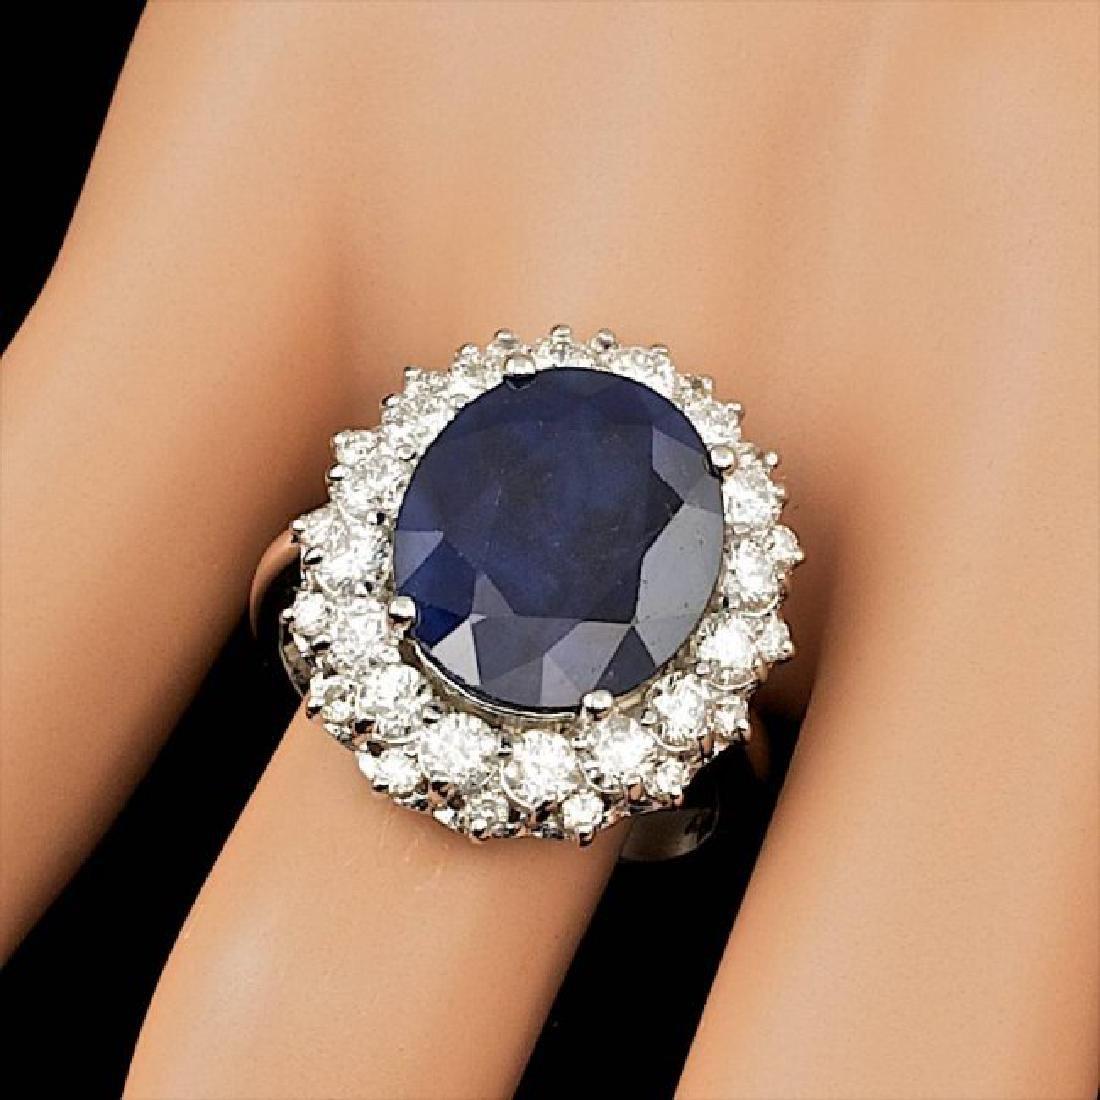 14k Gold 7.50ct Sapphire 1.75ct Diamond Ring - 3